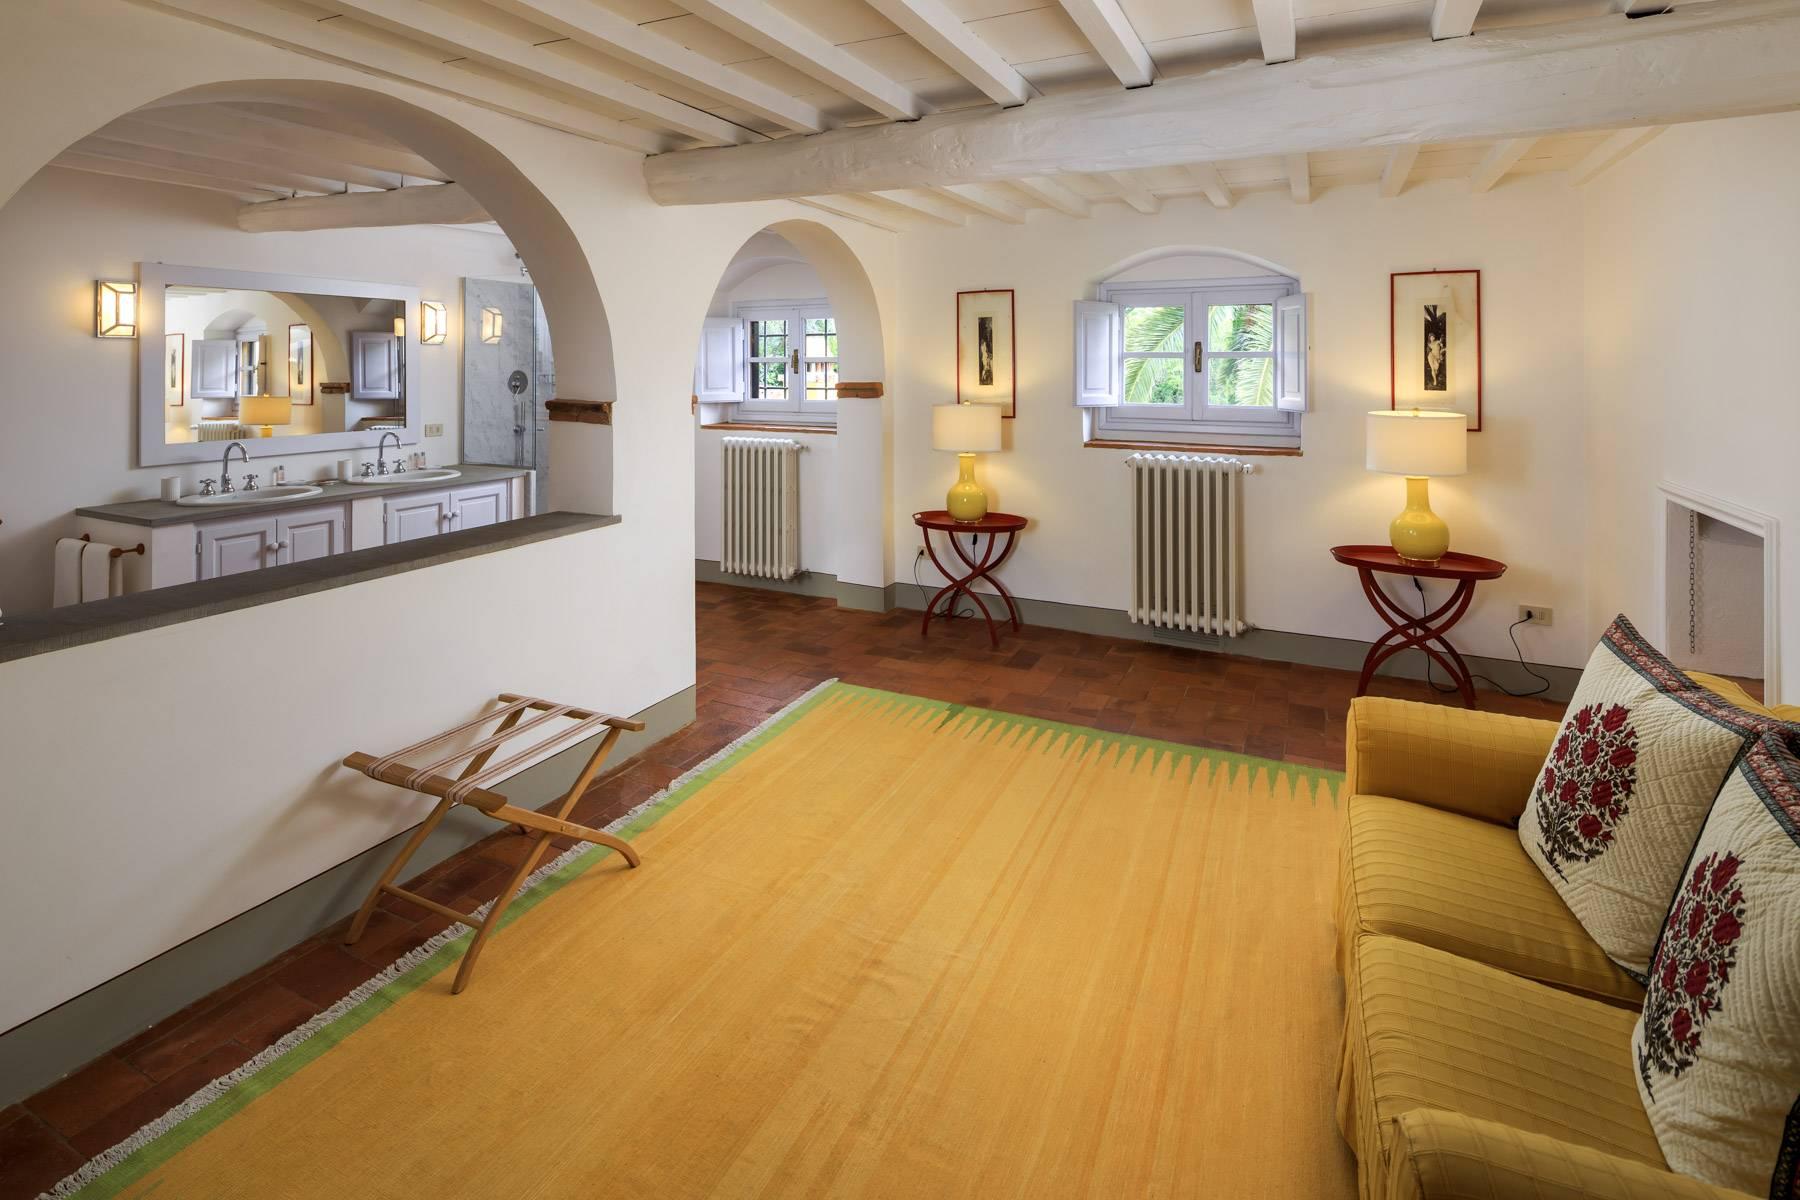 Villa in Affitto a Firenze: 5 locali, 600 mq - Foto 22